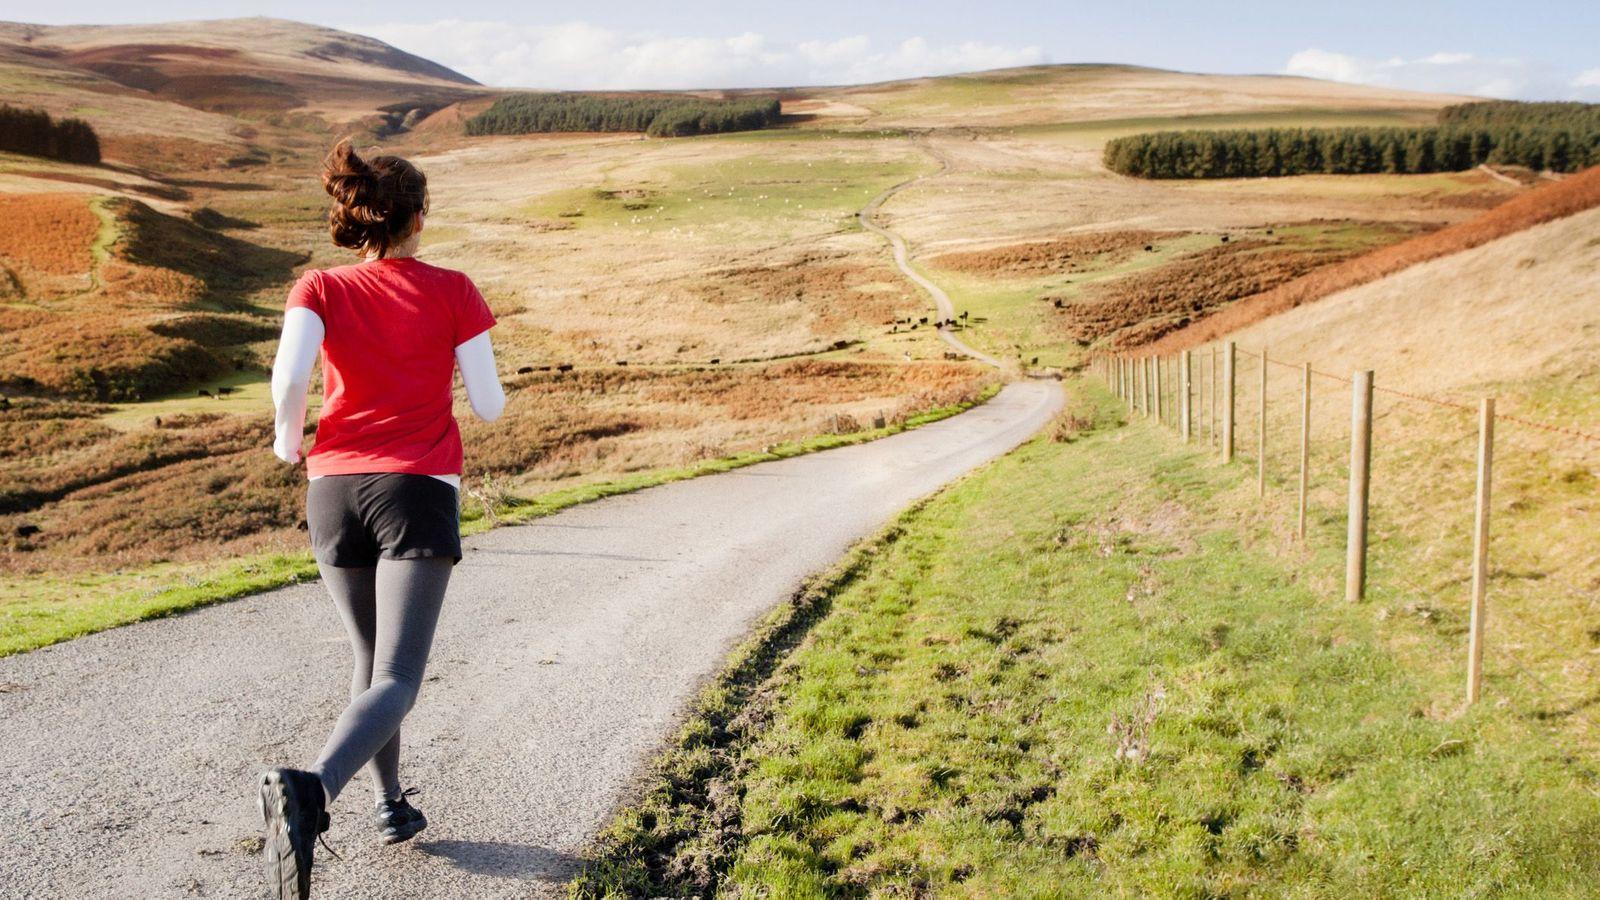 Run the world - τρέχοντας ολόκληρο τον πλανήτη